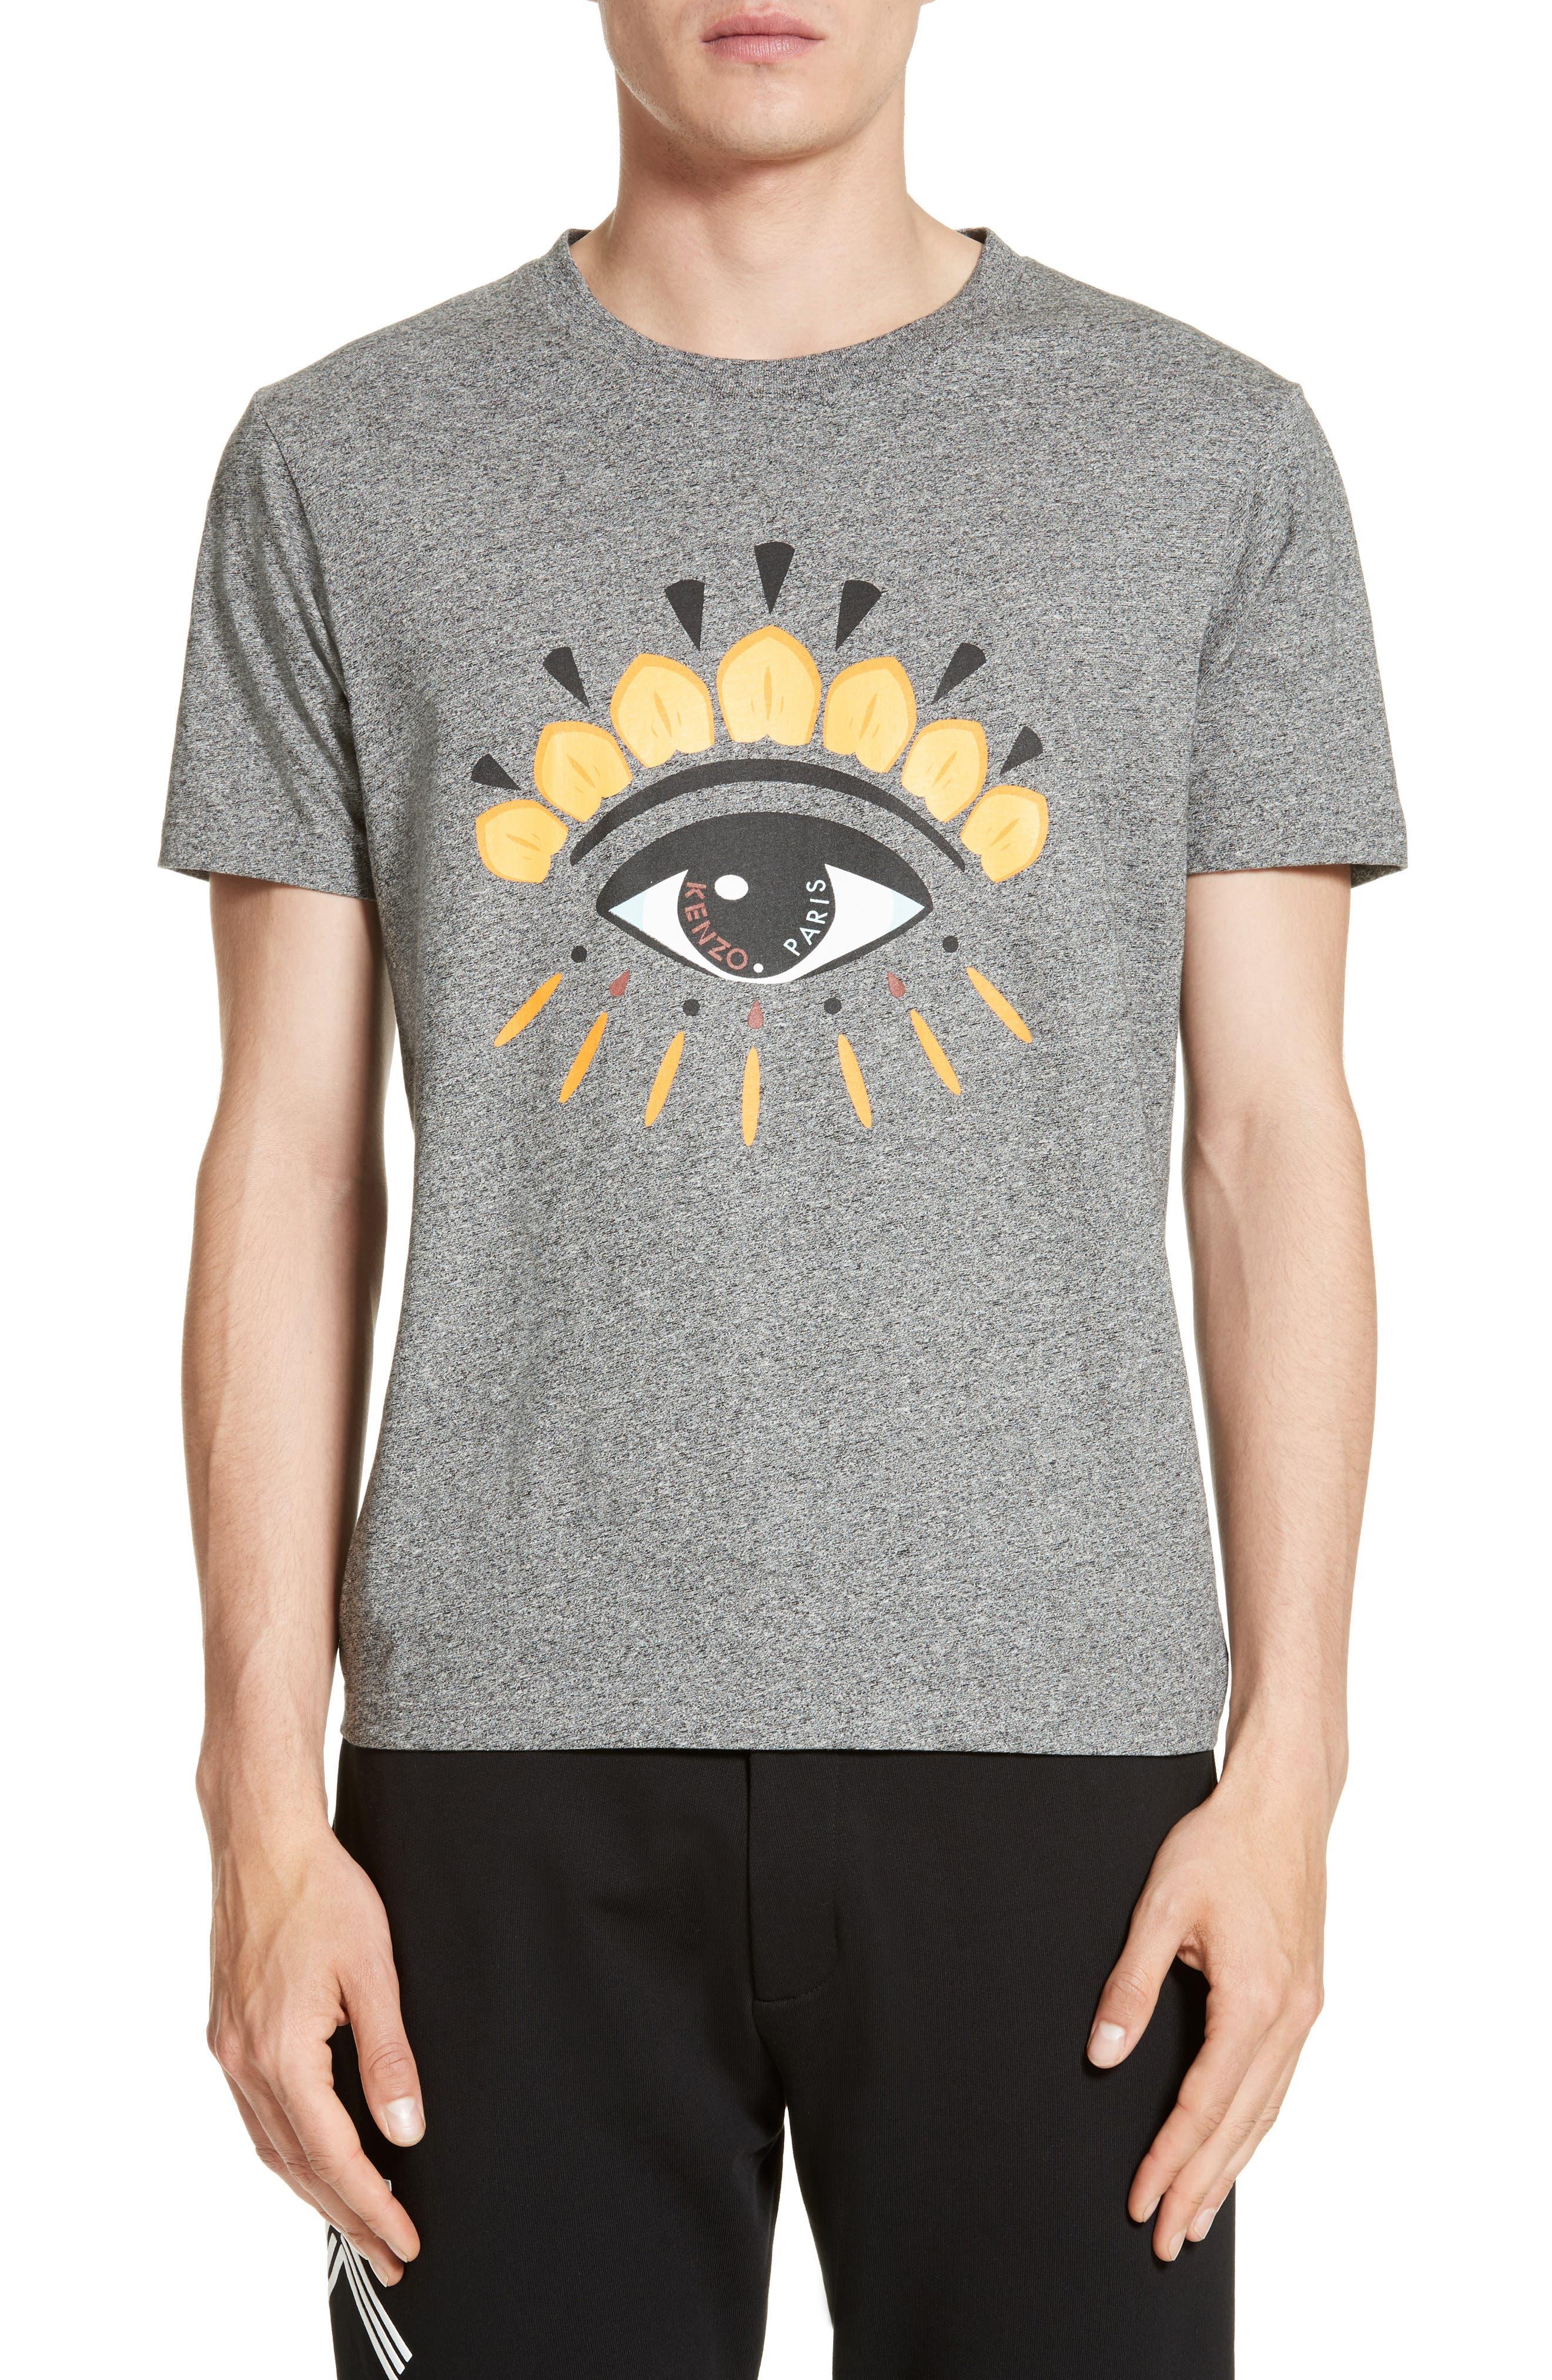 Kenzo Embroidered Eye T-Shirt